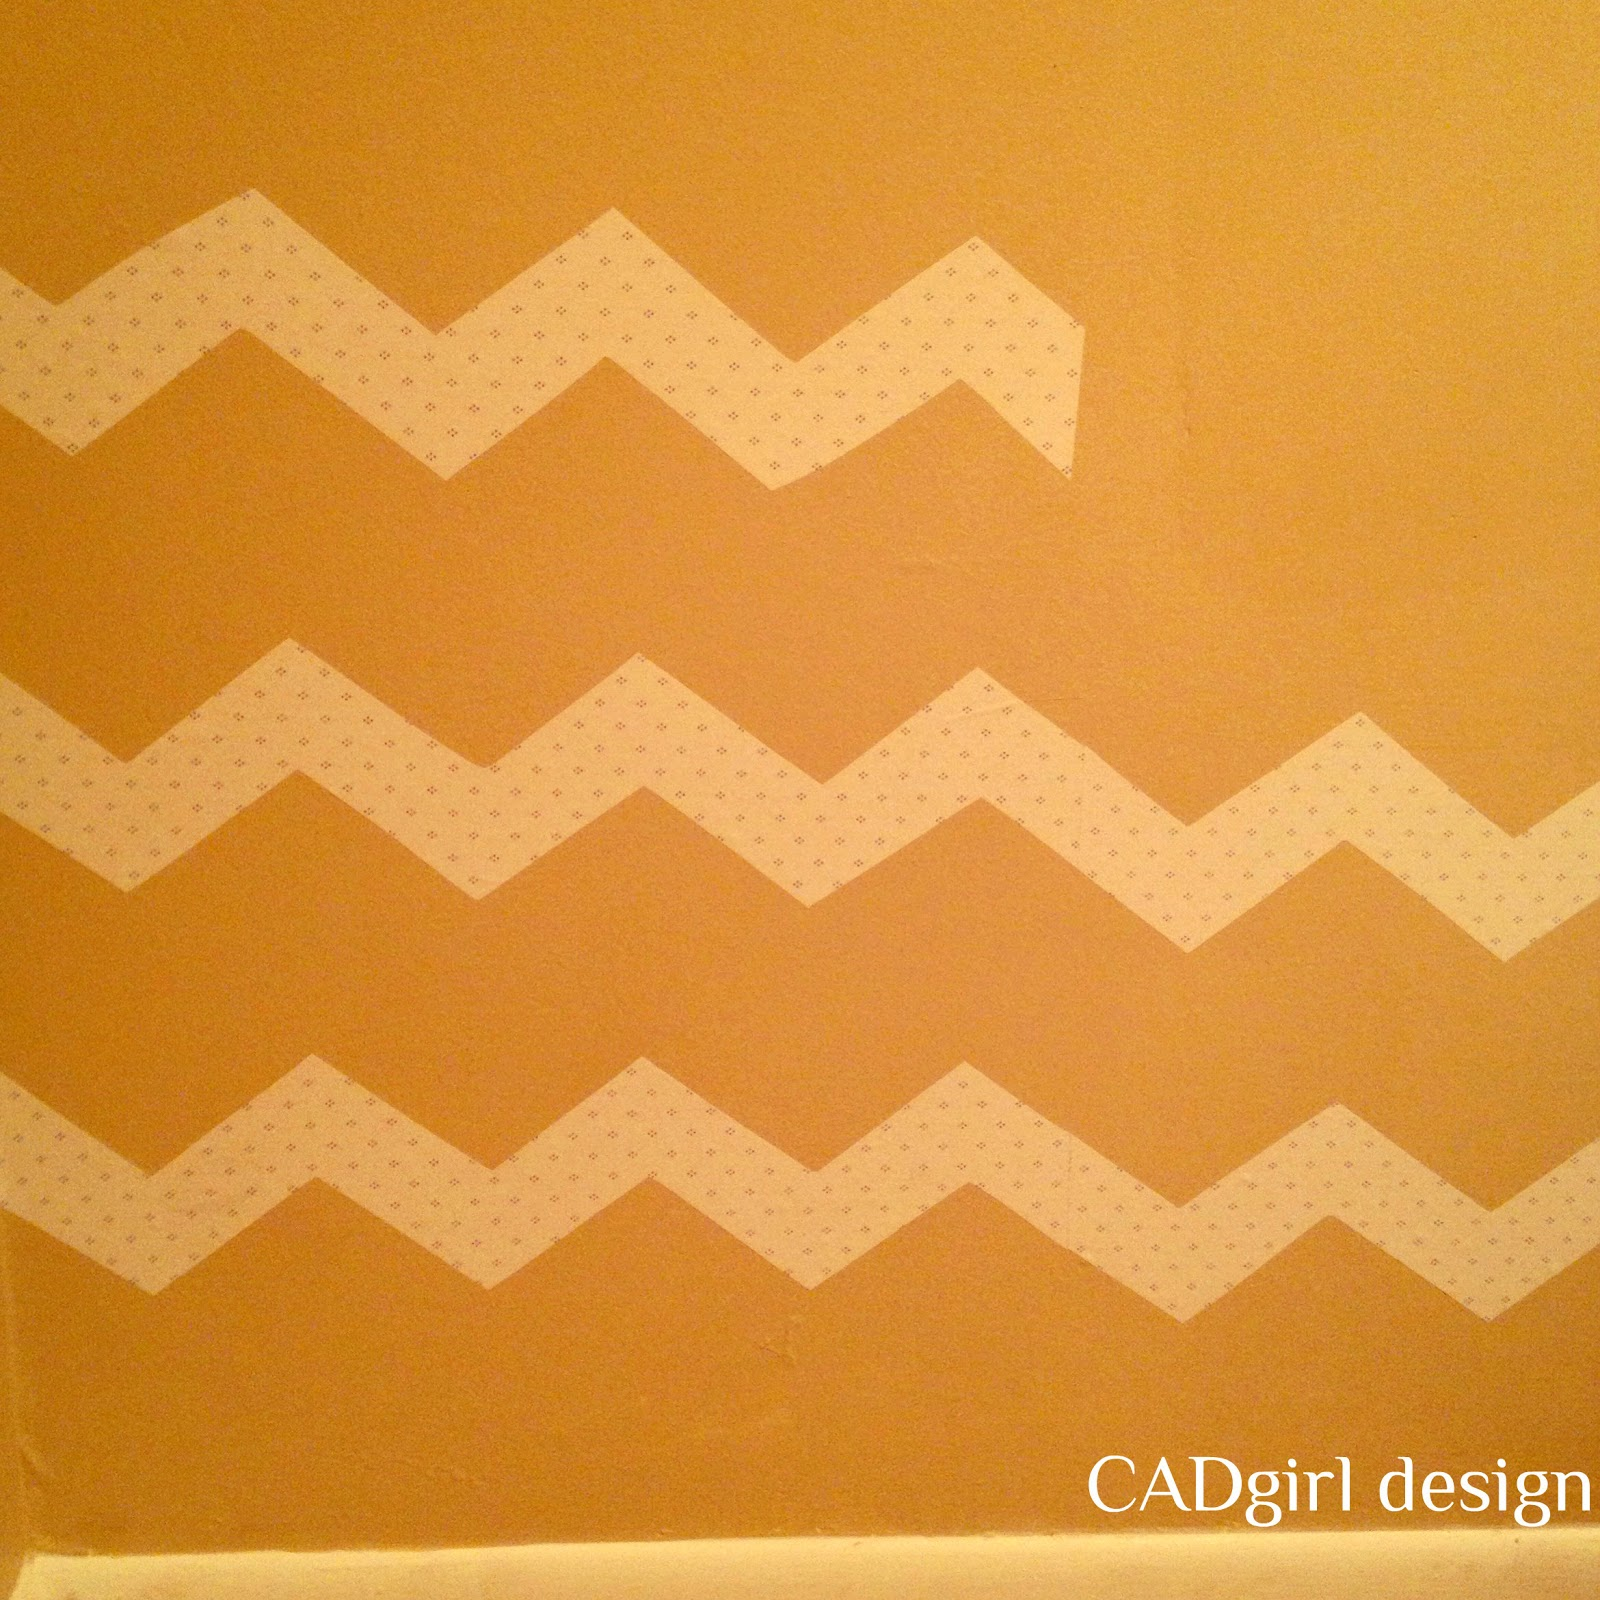 CADgirl design: Chevron Sparkled Wall